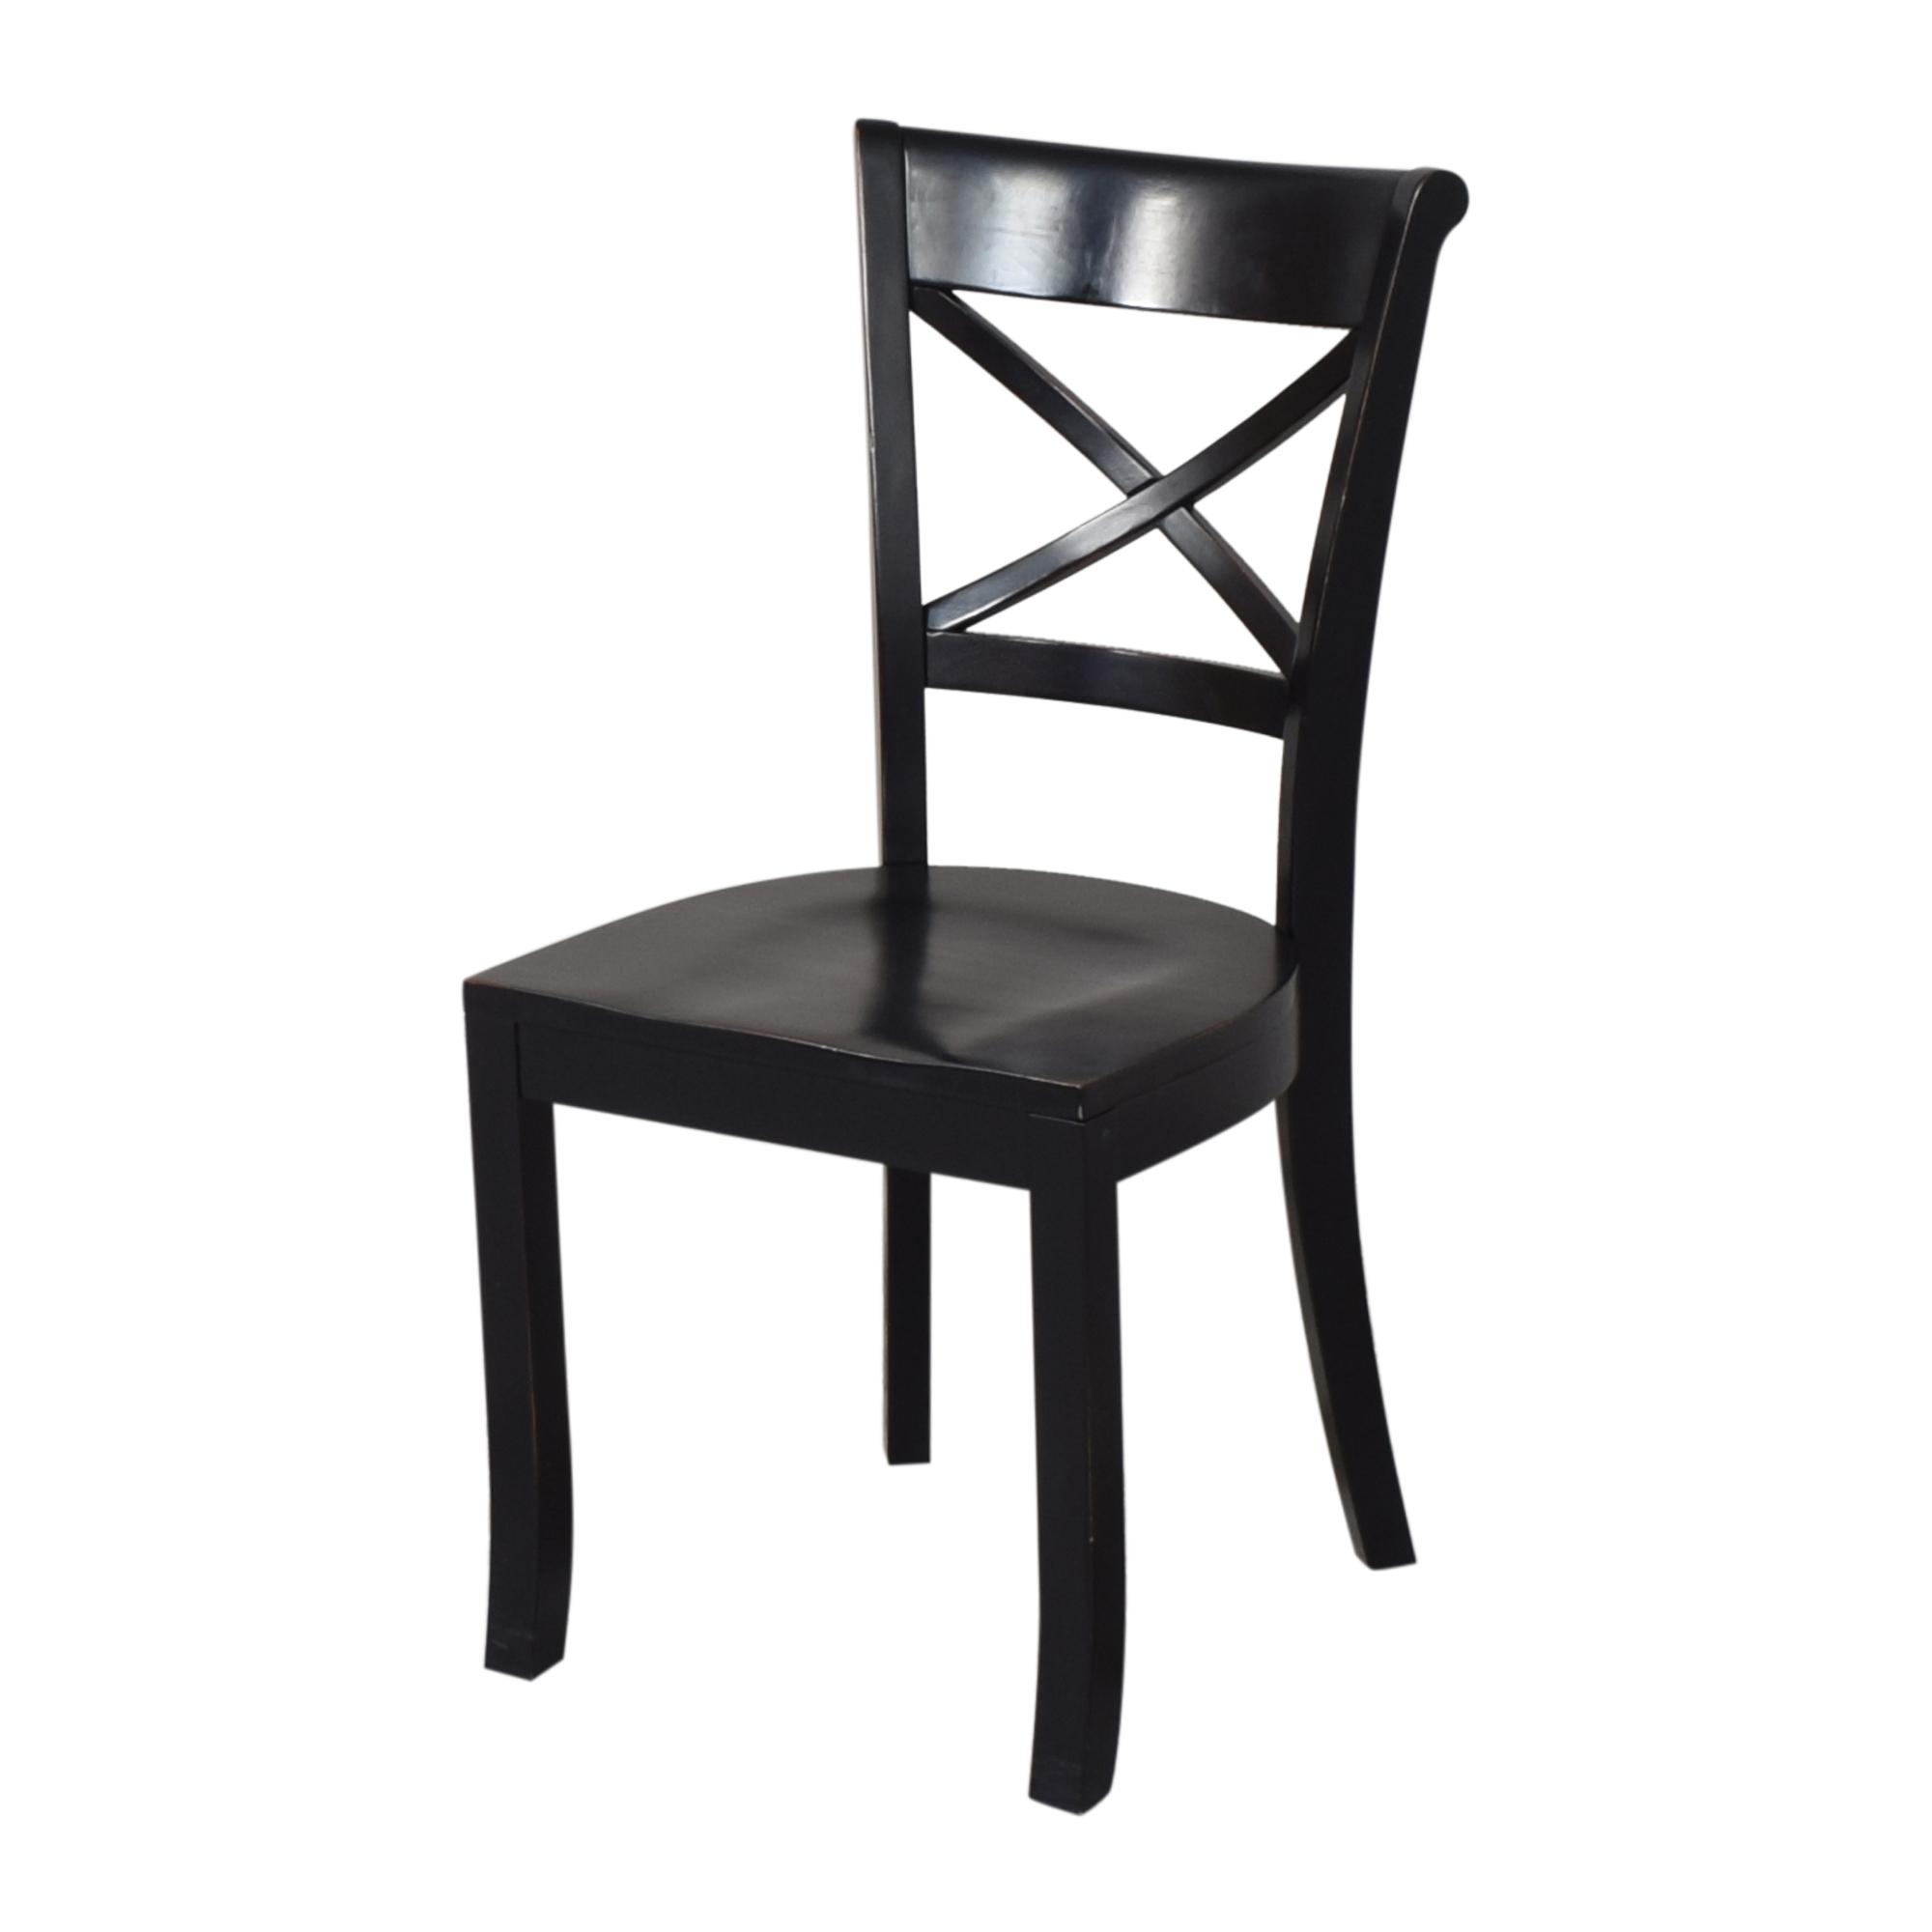 Crate & Barrel Crate & Barrel Vintner X Back Dining Chairs